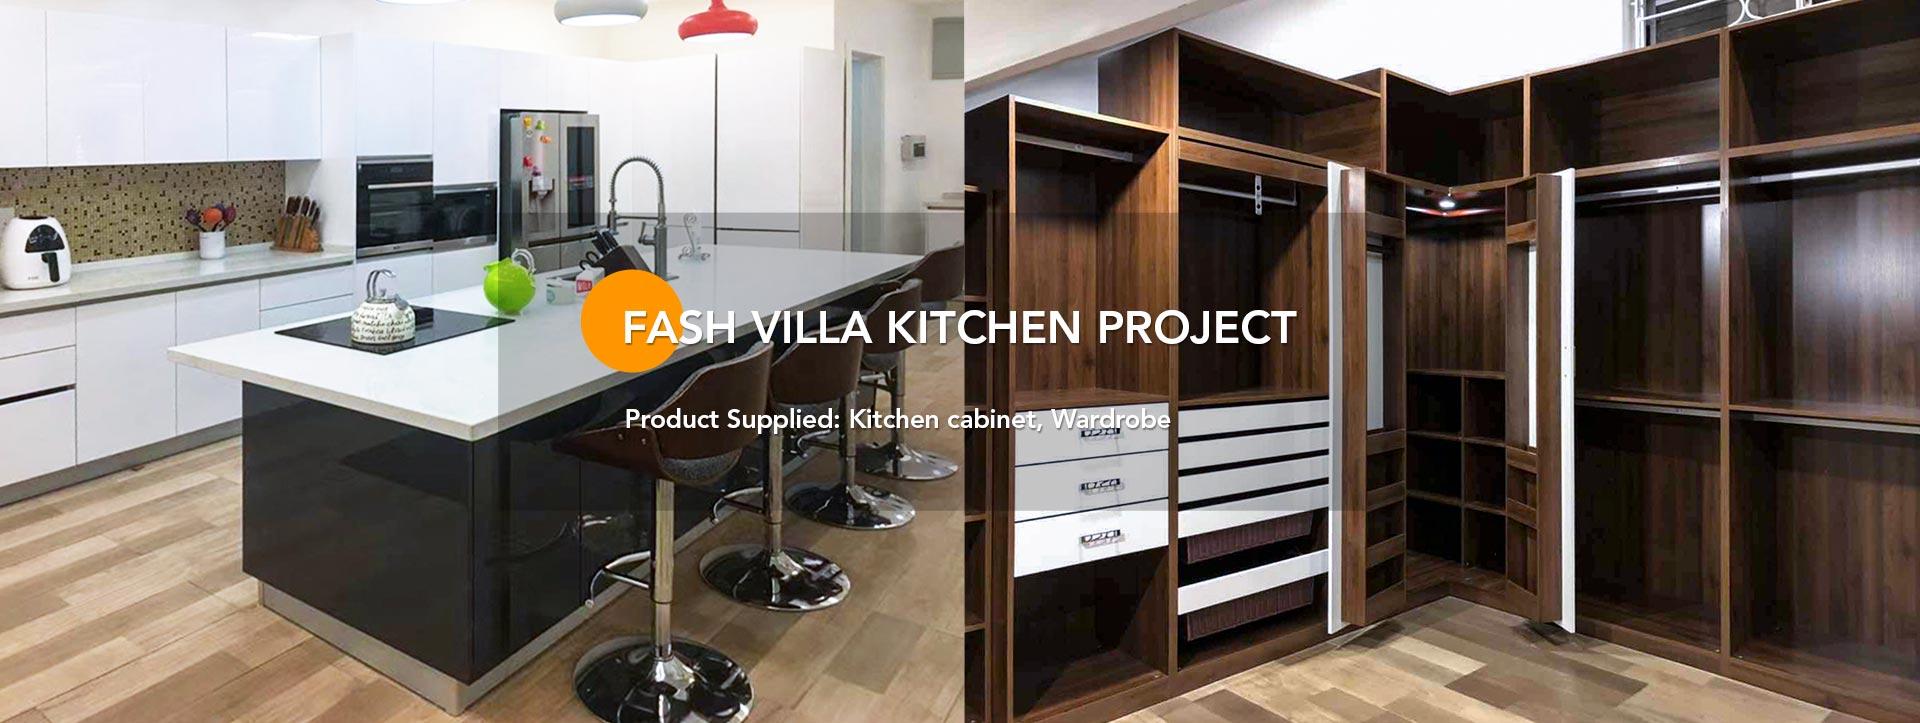 Fash-Villa-Kitchen-Wardrobe (1)